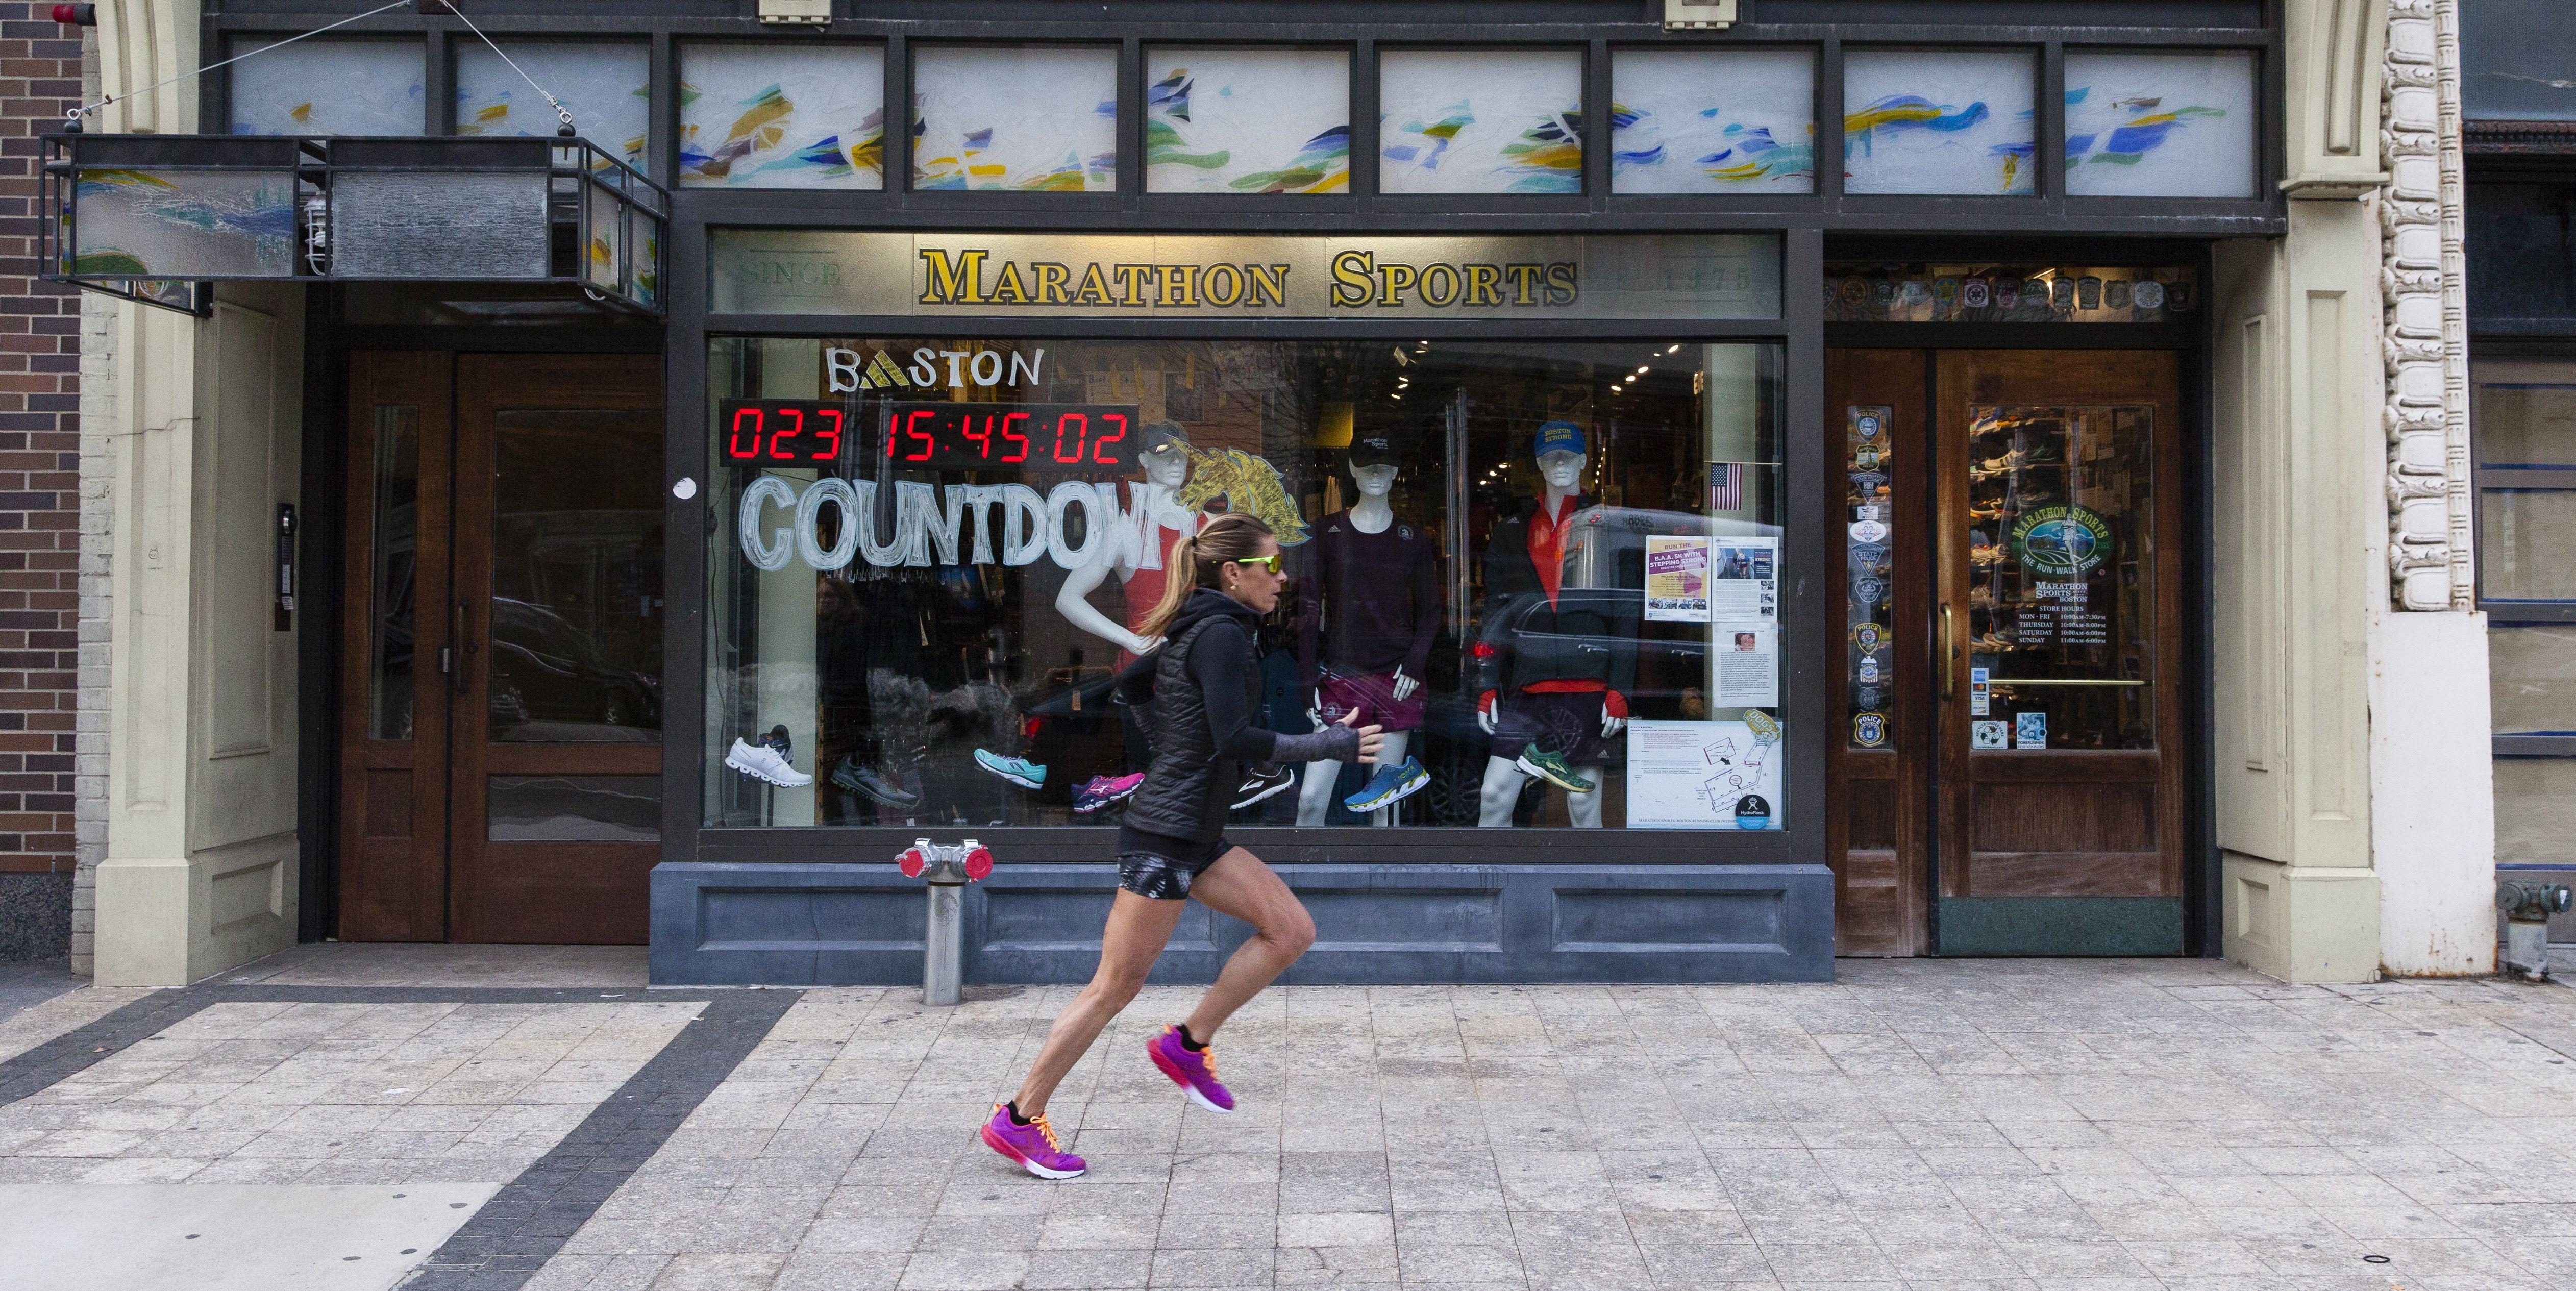 Marathon Sports